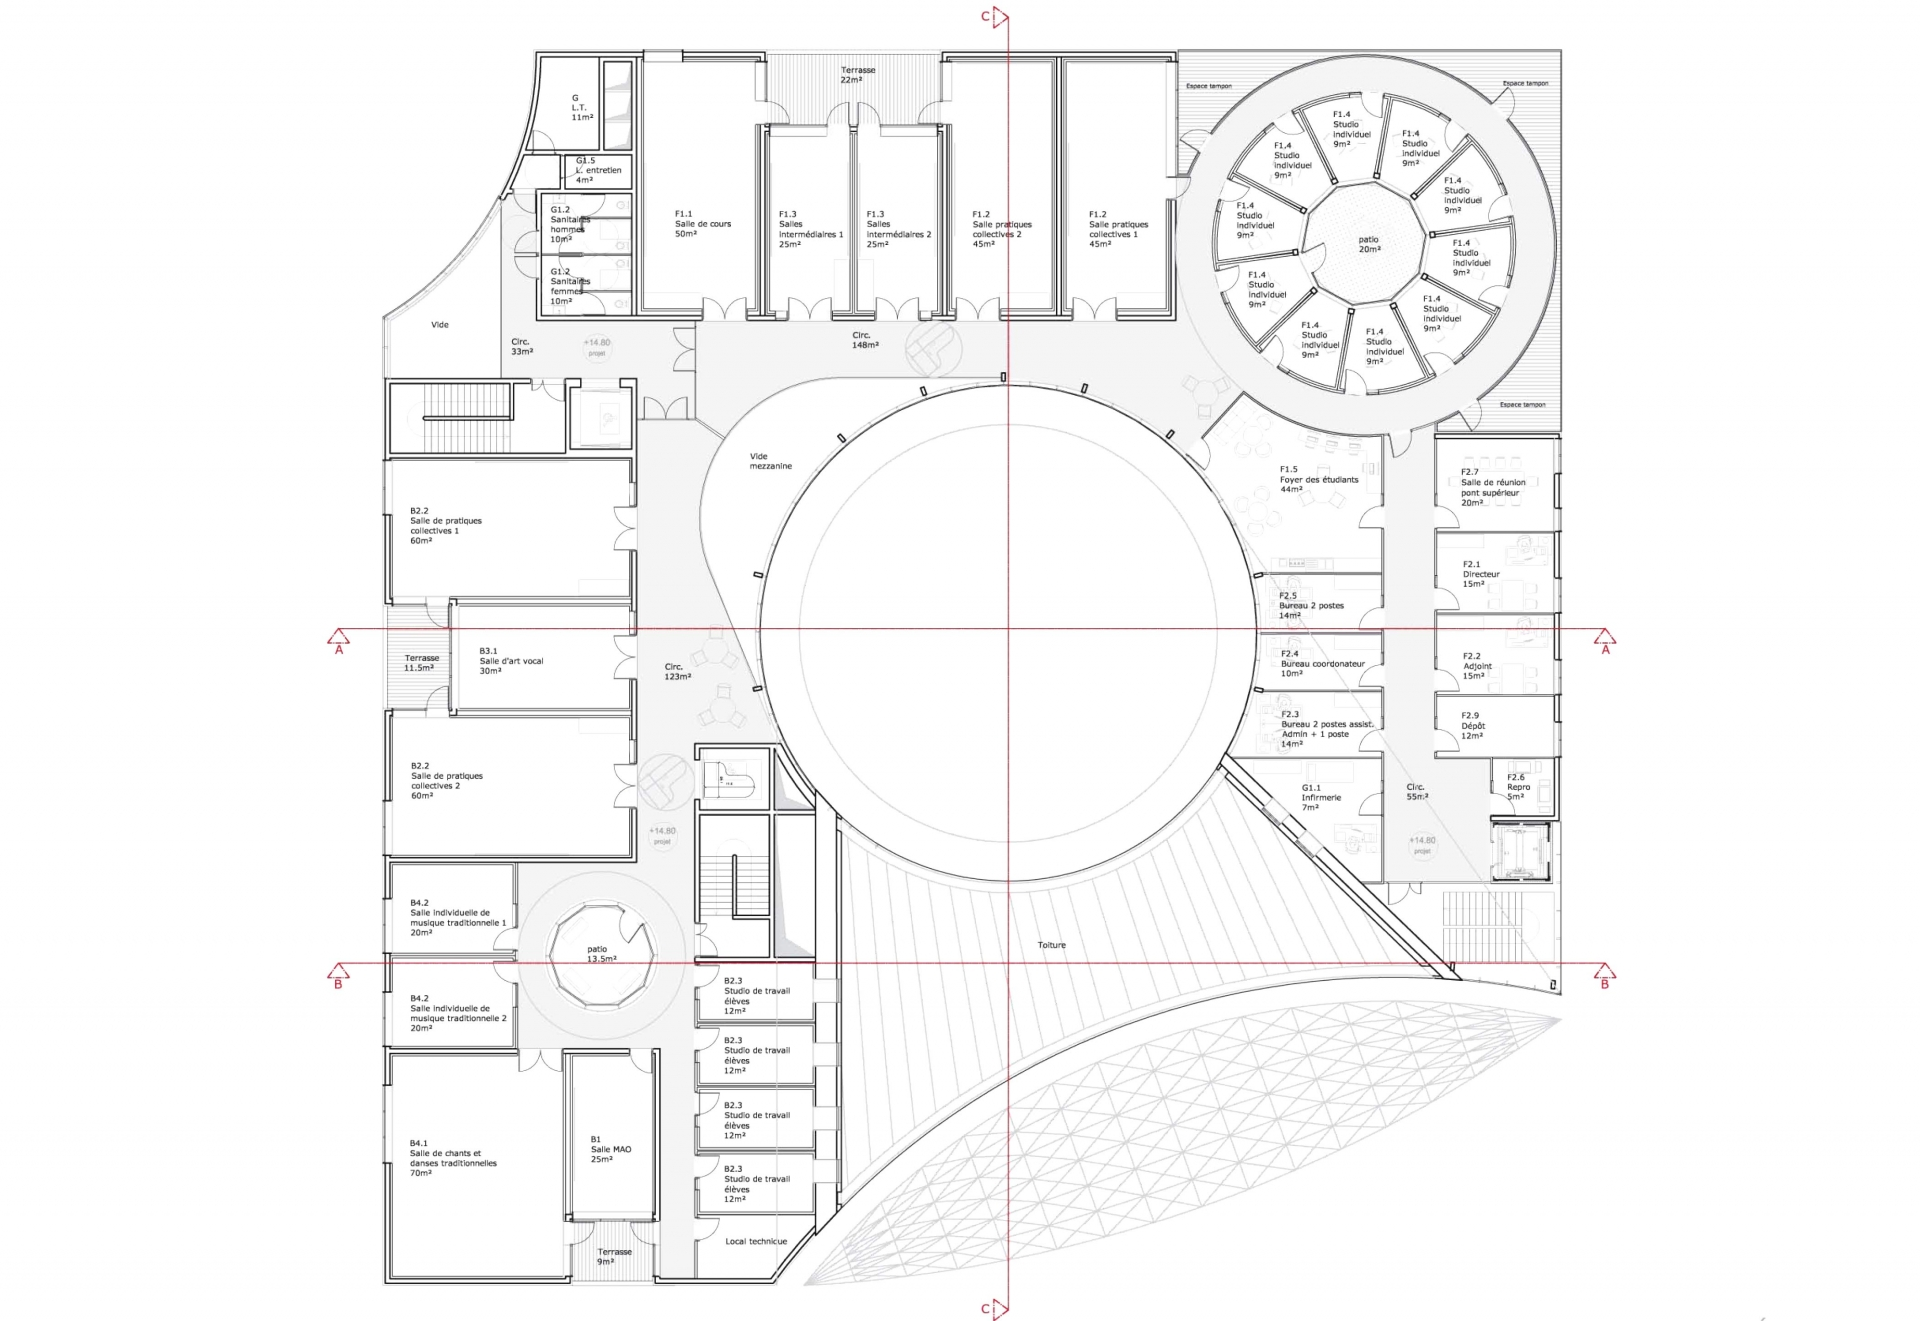 Conservatoire - Plan 4 ©Tetrarc